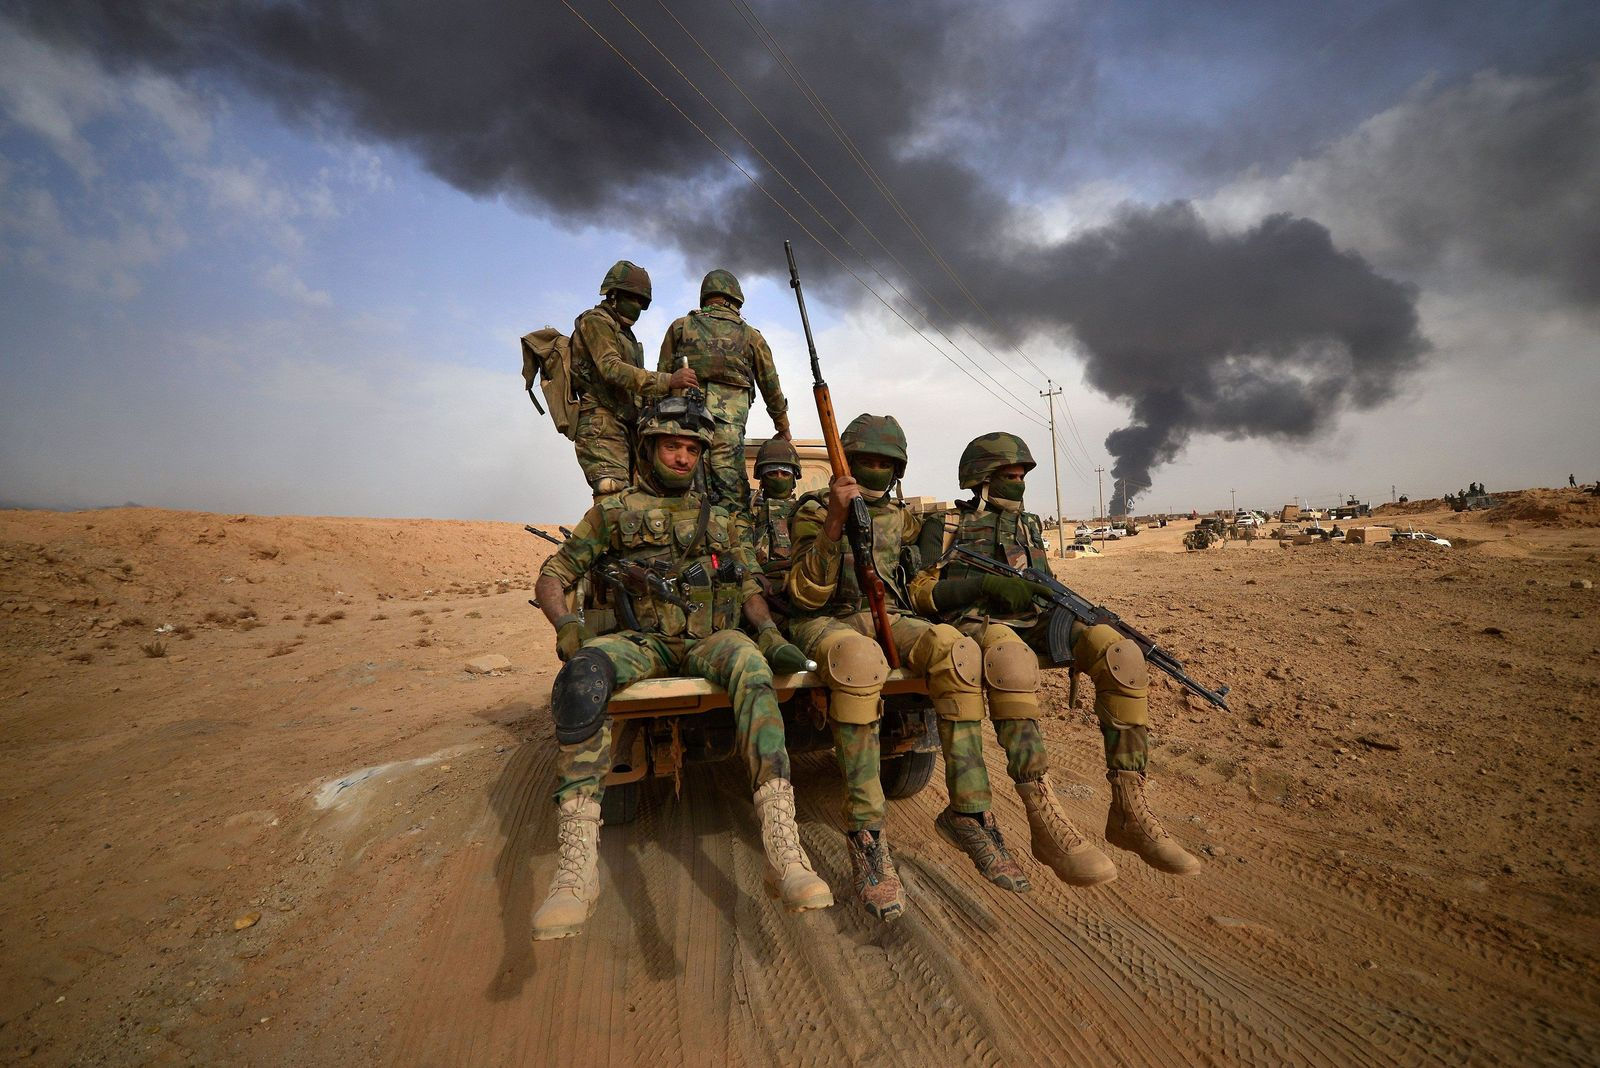 MIDEAST-CRISIS/IRAQ-ISLAMICSTATE